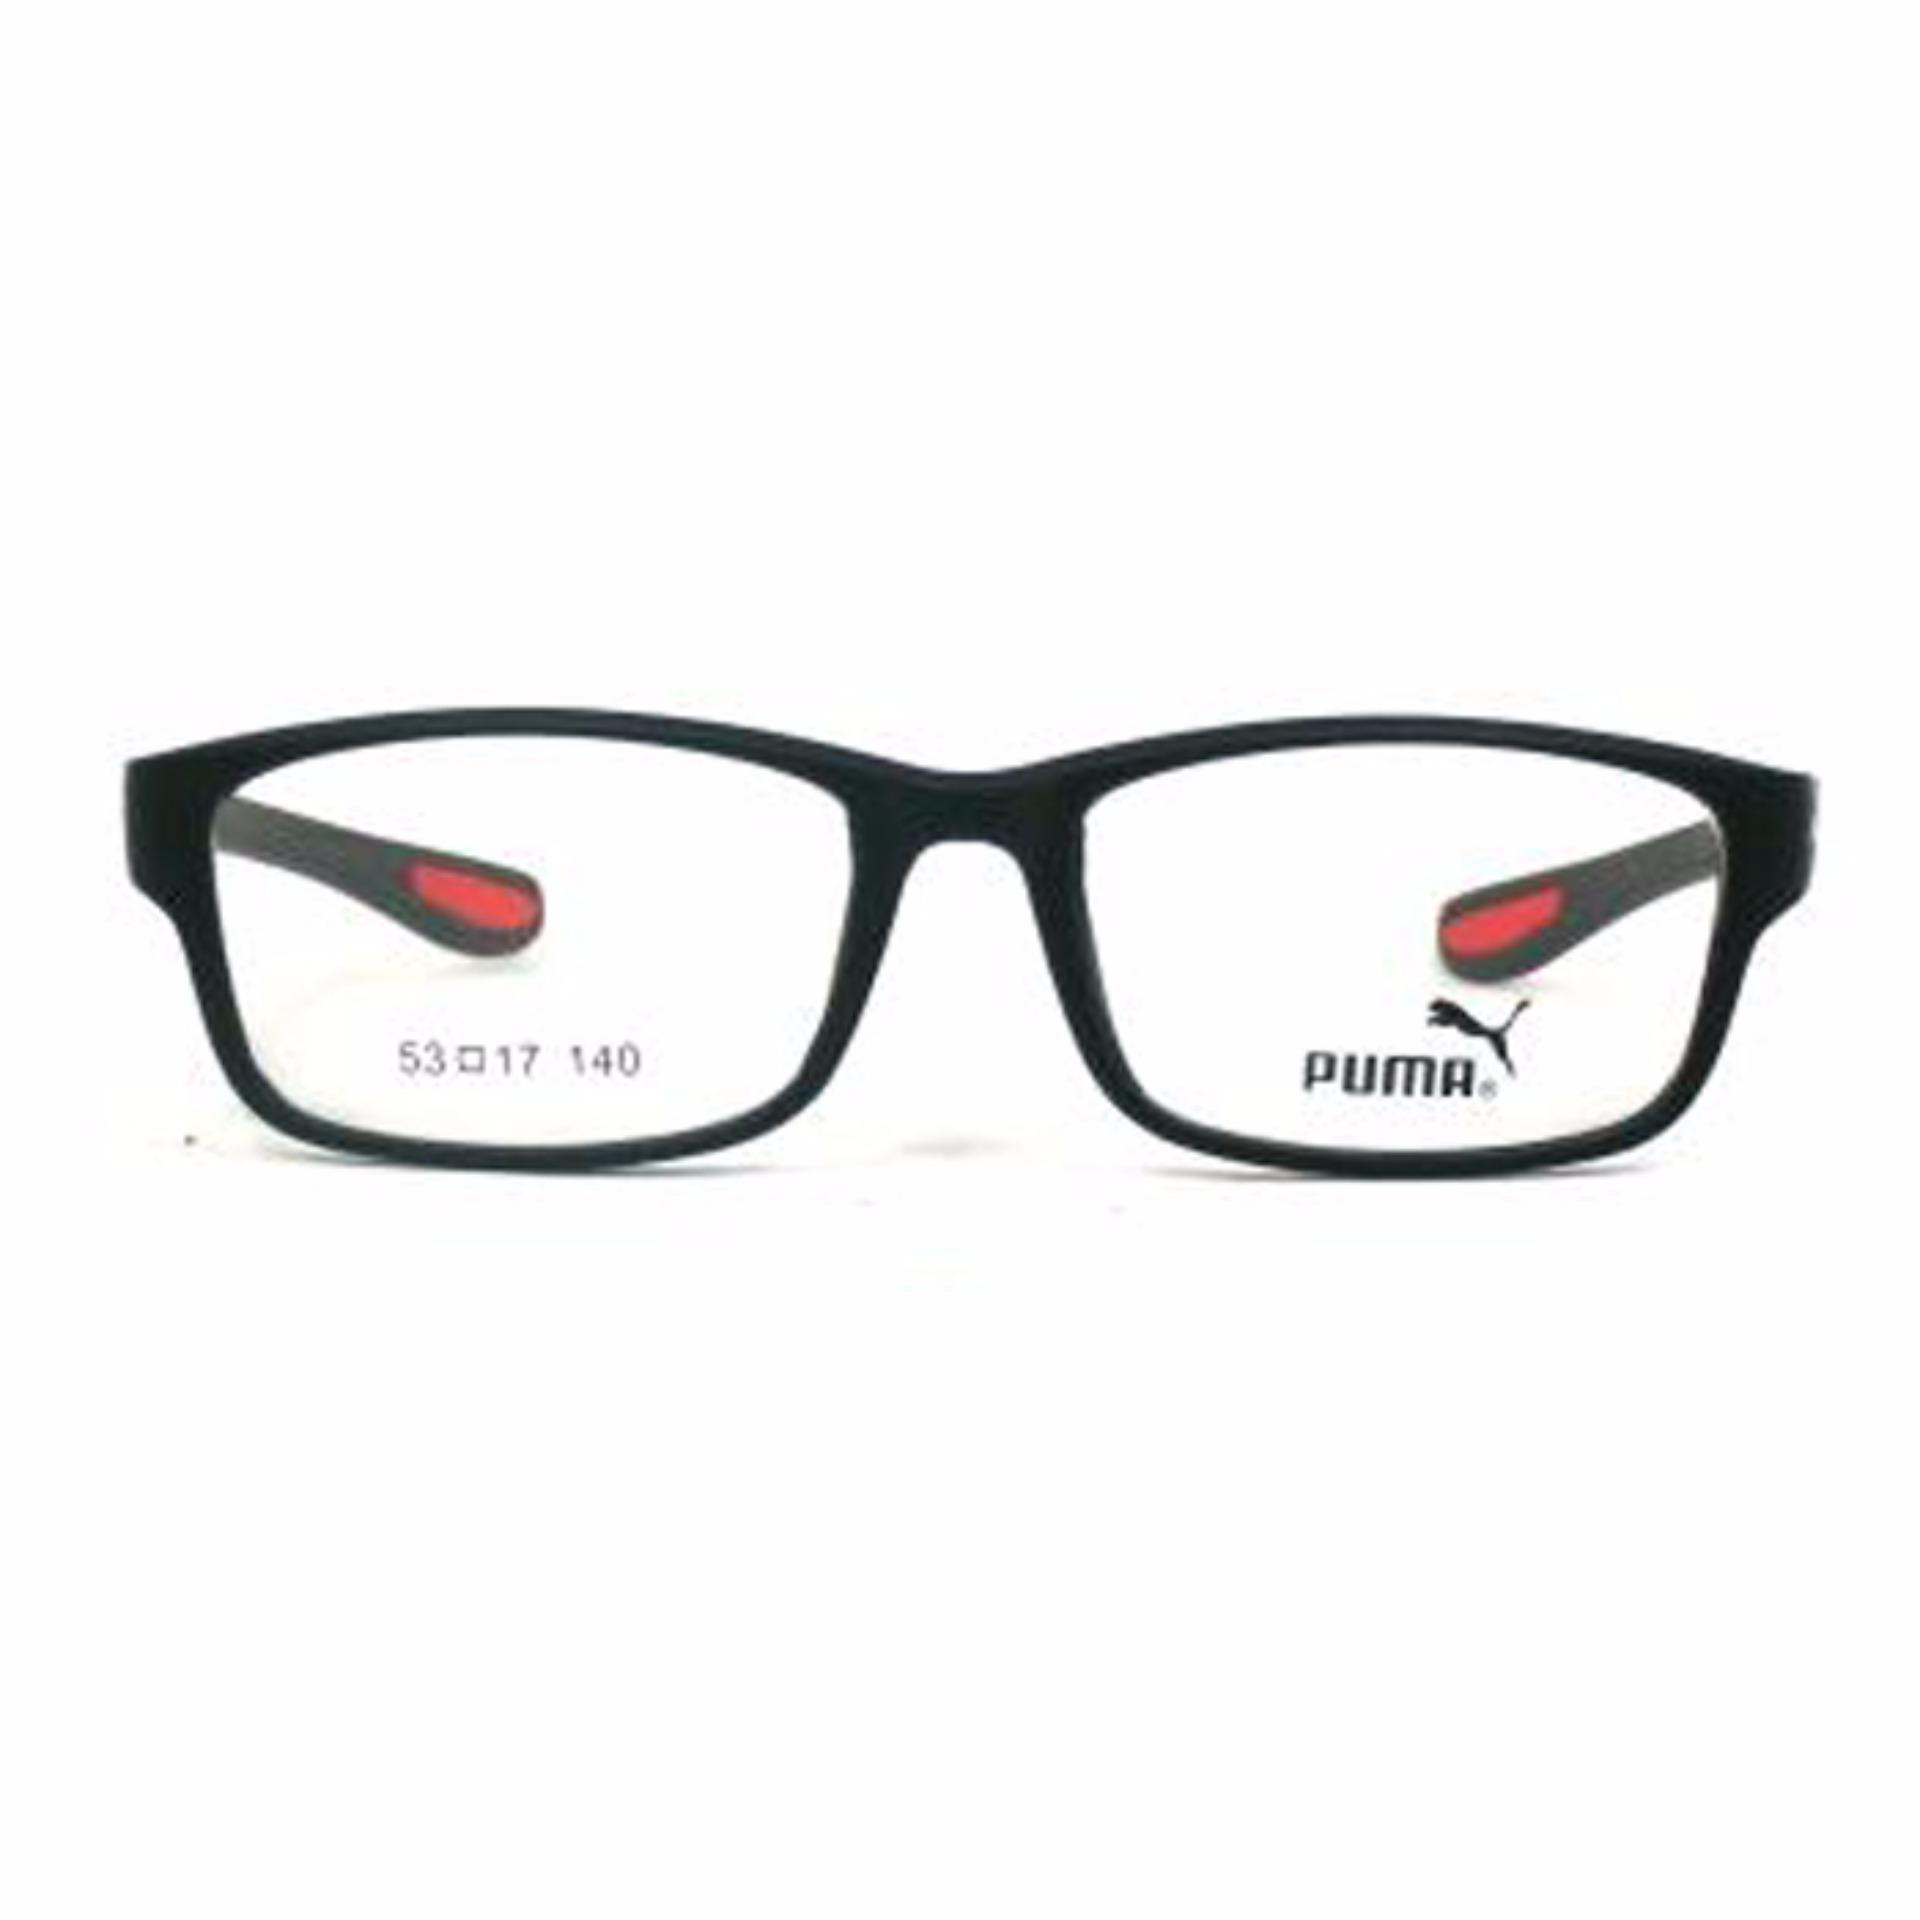 ... Frame Kacamata Pria Sporty Puma P833 Bisa Dipasang Lensa Minus Di Optik Terdekat ...